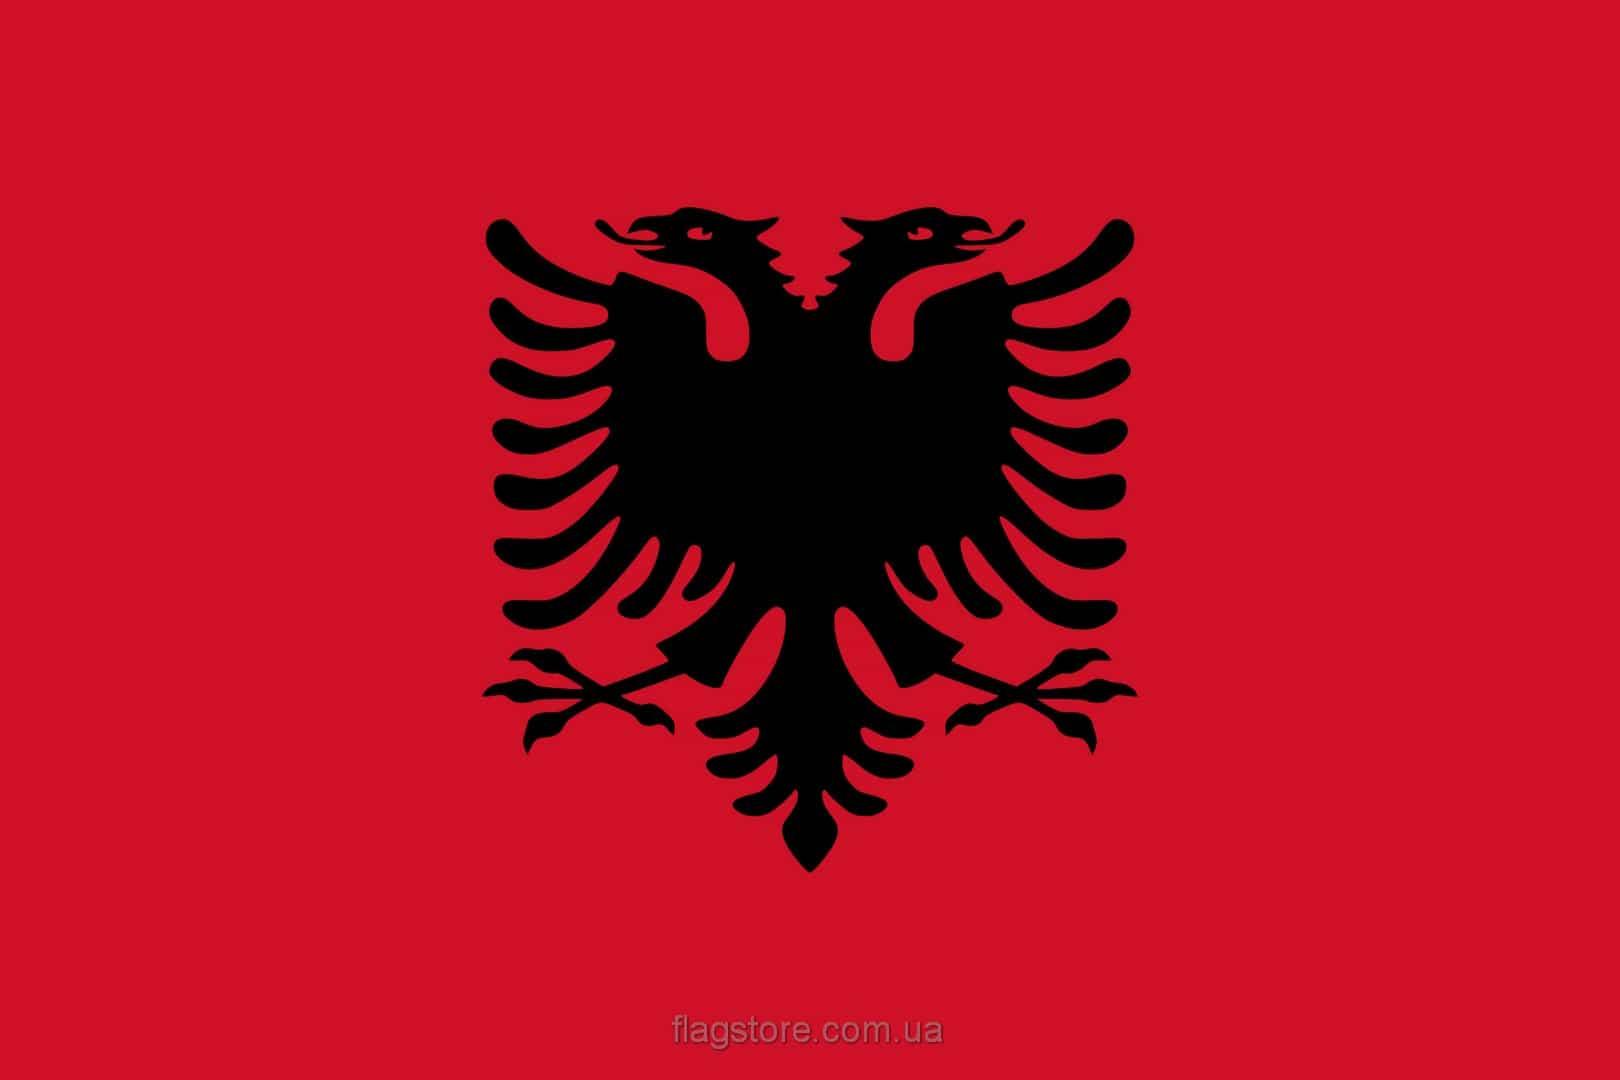 Купить флаг Албании (страны Албания)